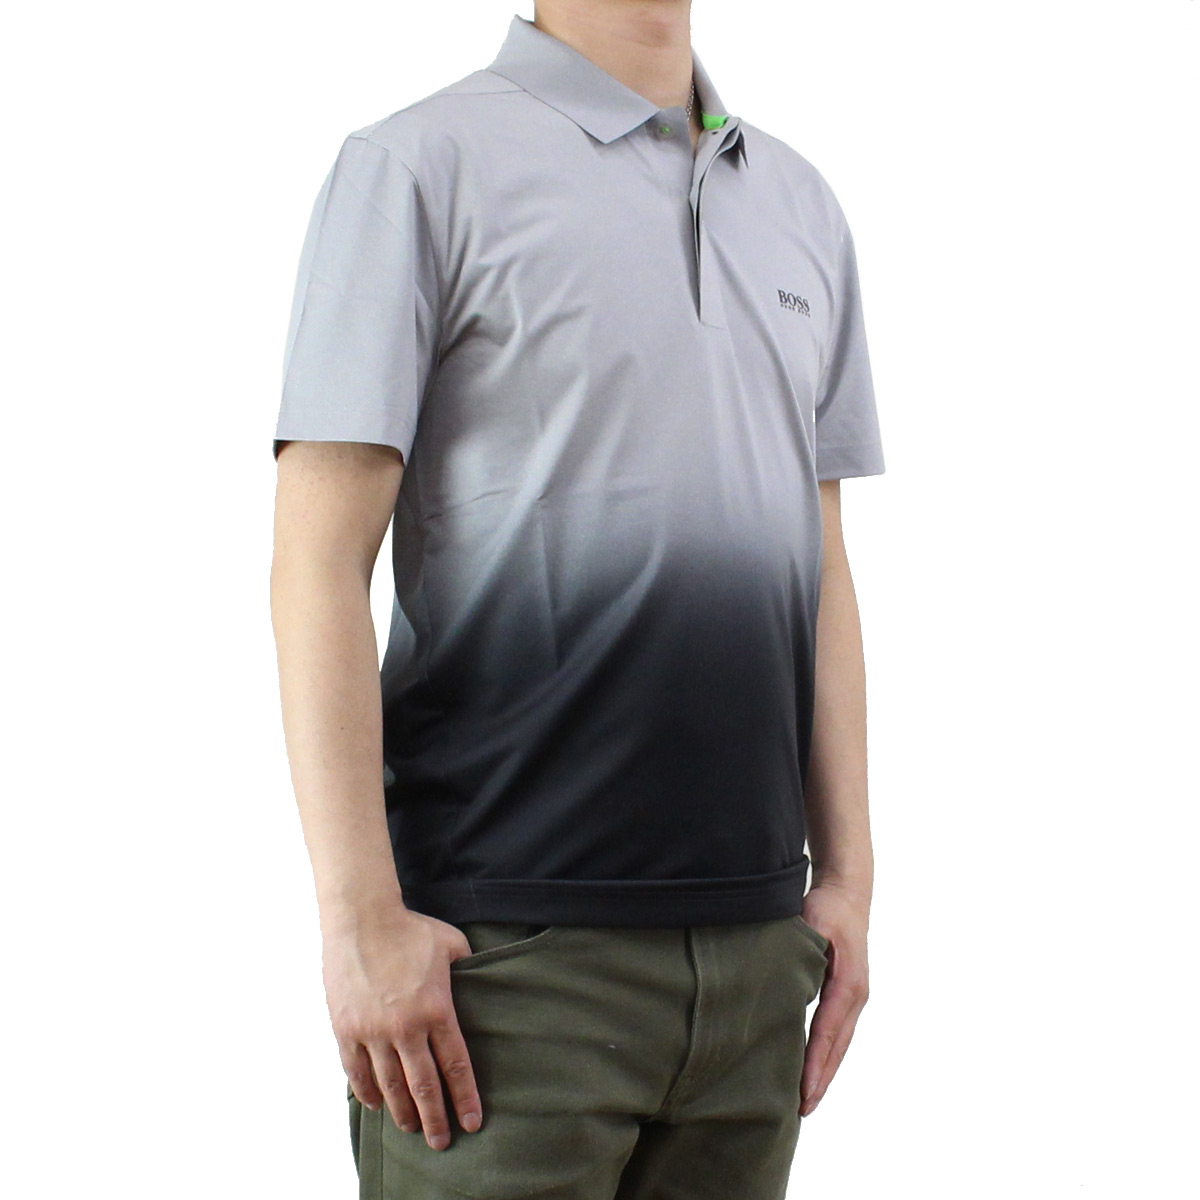 19f2ccd0 Bighit The total brand wholesale: Hugo boss (HUGO BOSS) PLYOTECH men polo  shirt gradation 50332099 10197607 058 gray system, black | Rakuten Global  Market